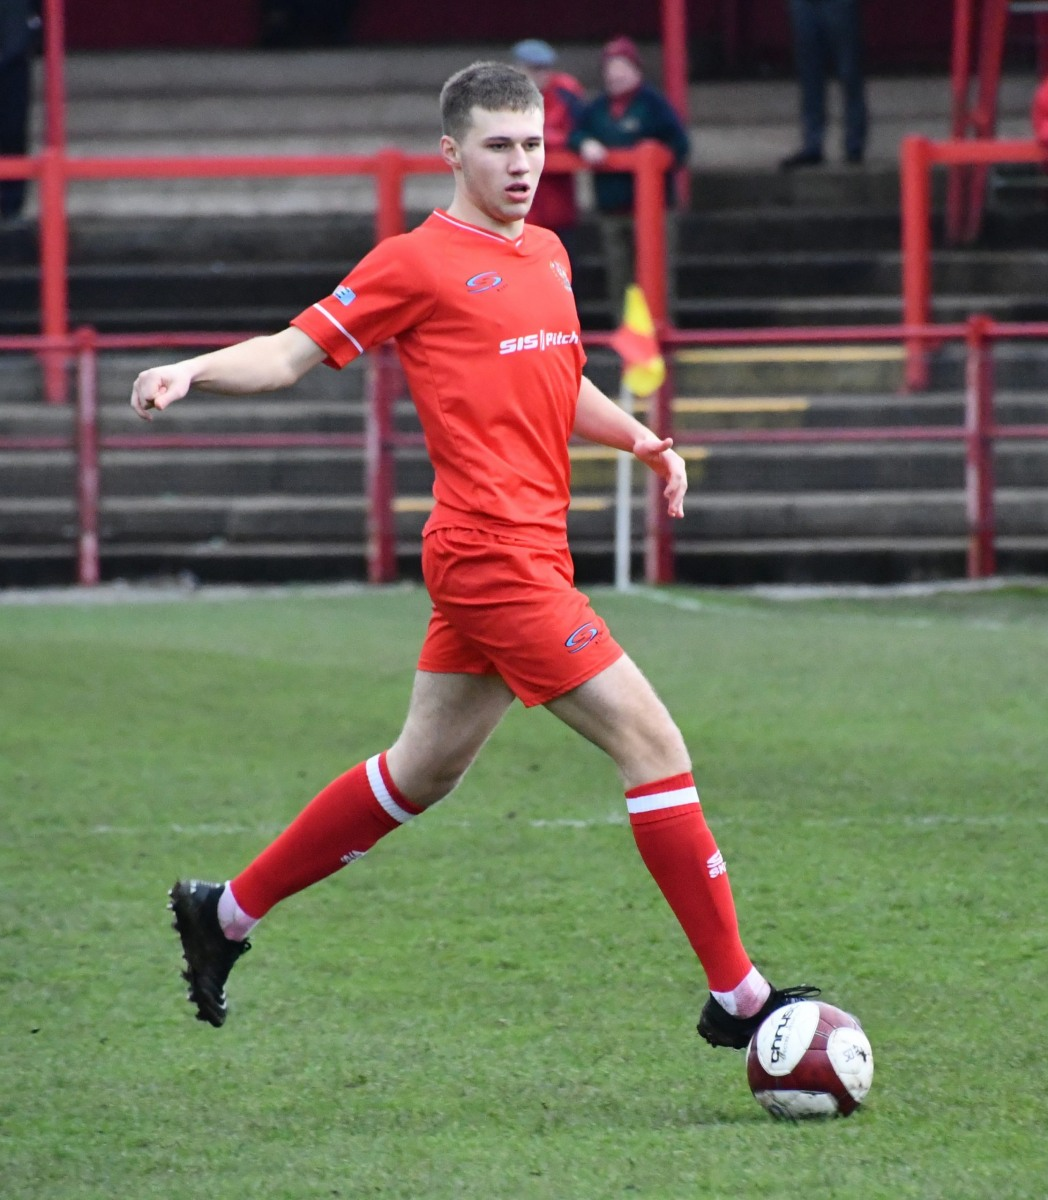 Workington-Reds-v-Trafford-Ben-Challis-4-scaled